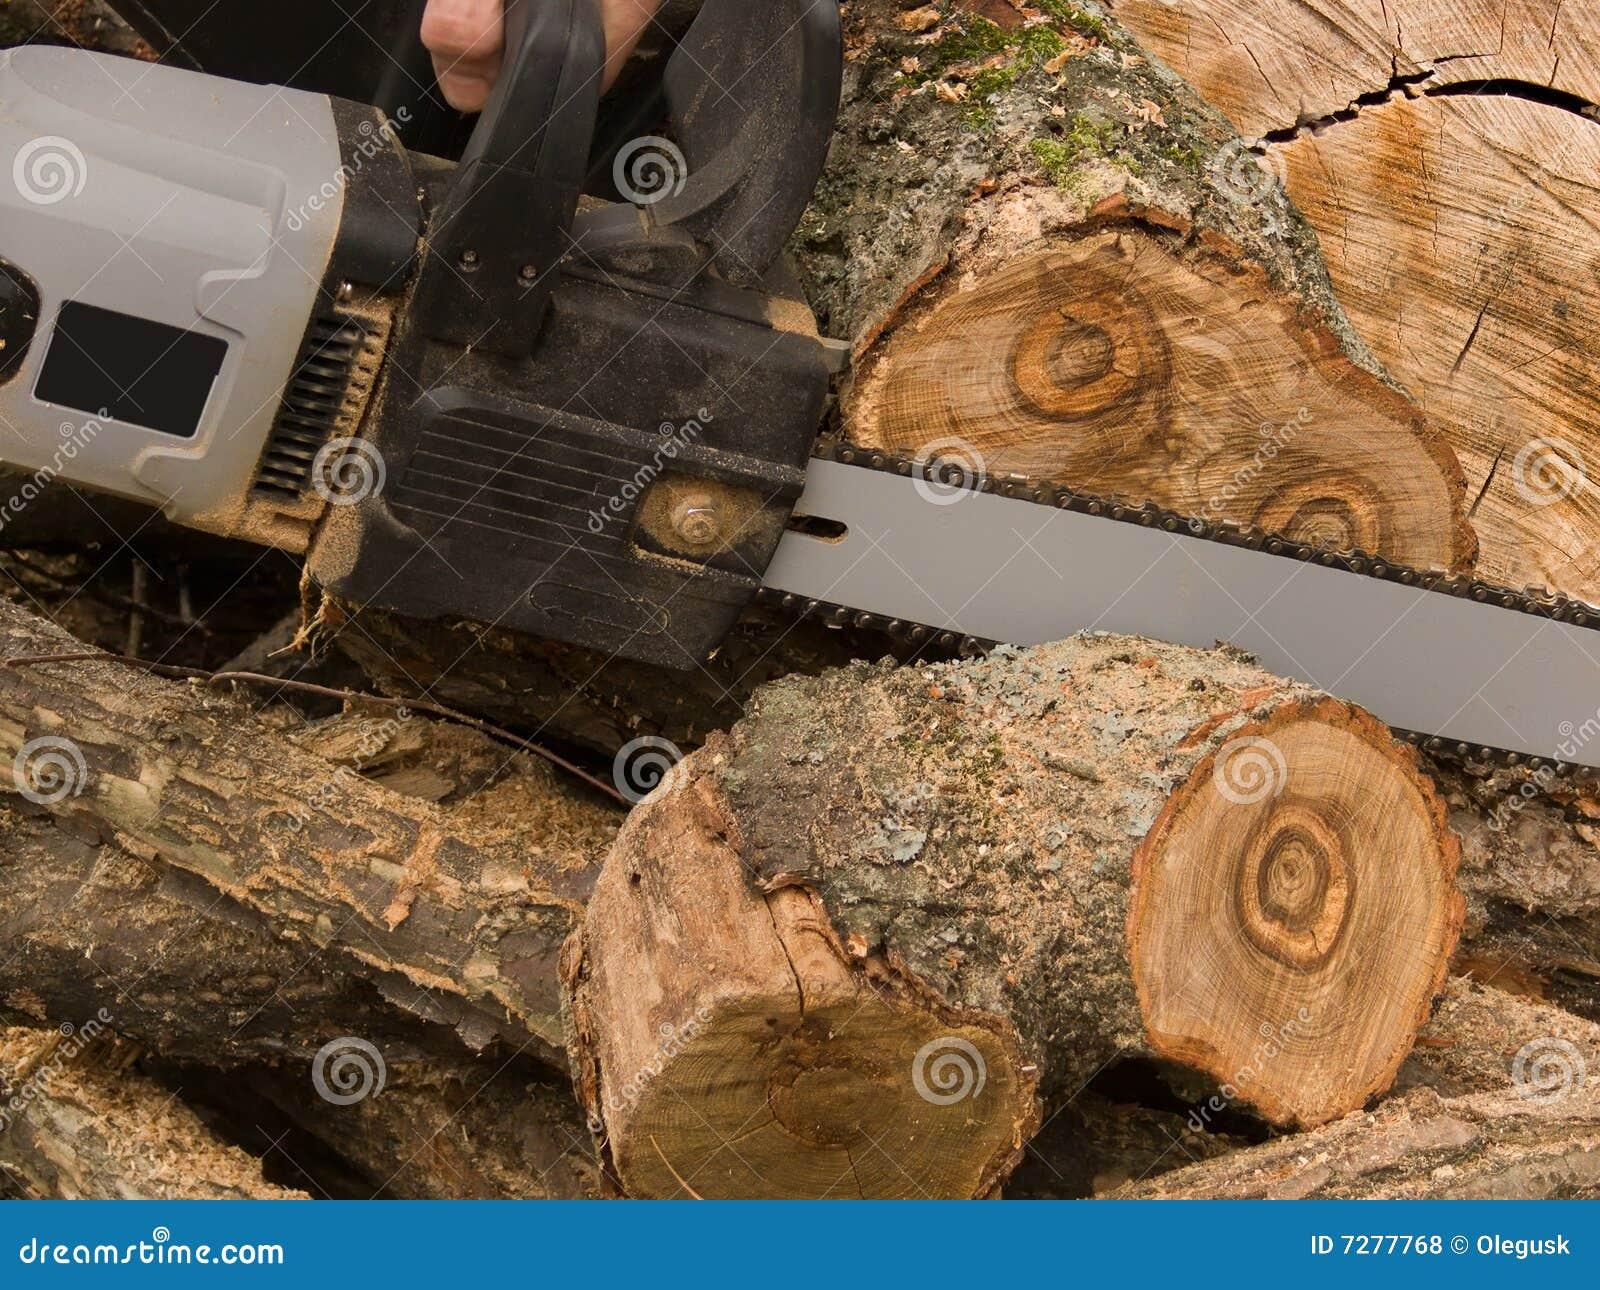 La herramienta una sierra eléctrica